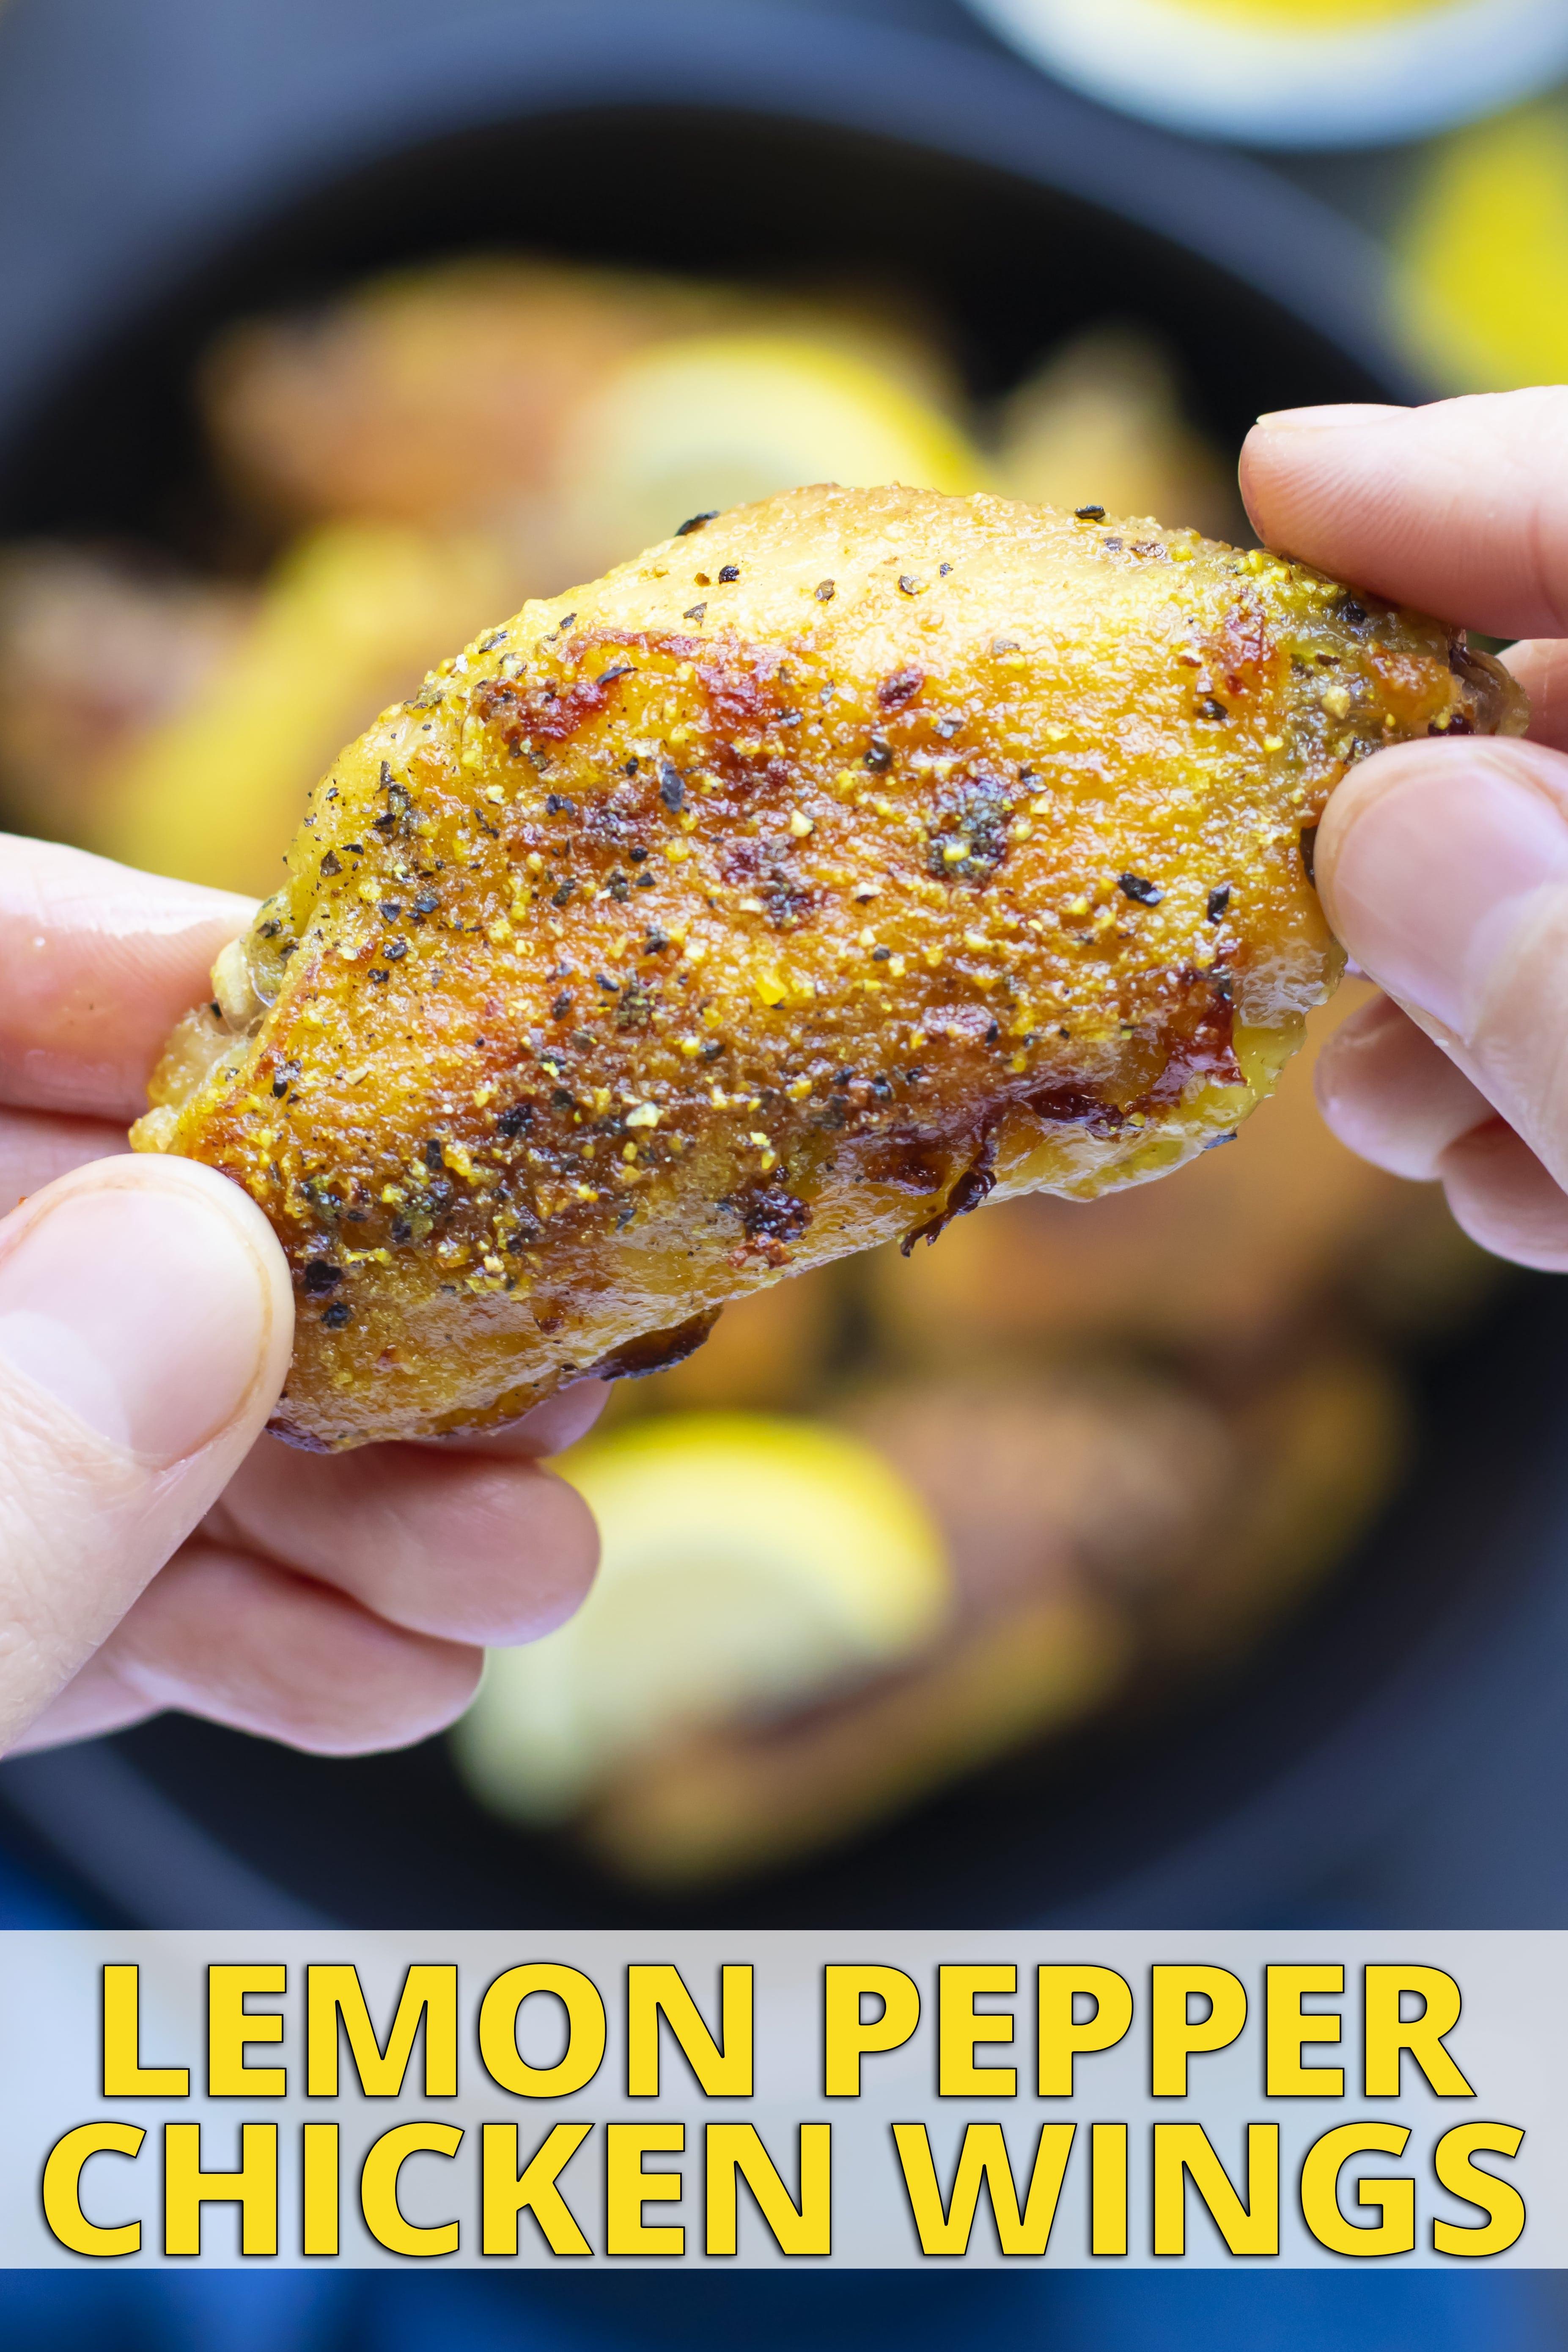 Hands picking up a lemon pepper chicken wing from a bowl of lemon pepper wings.